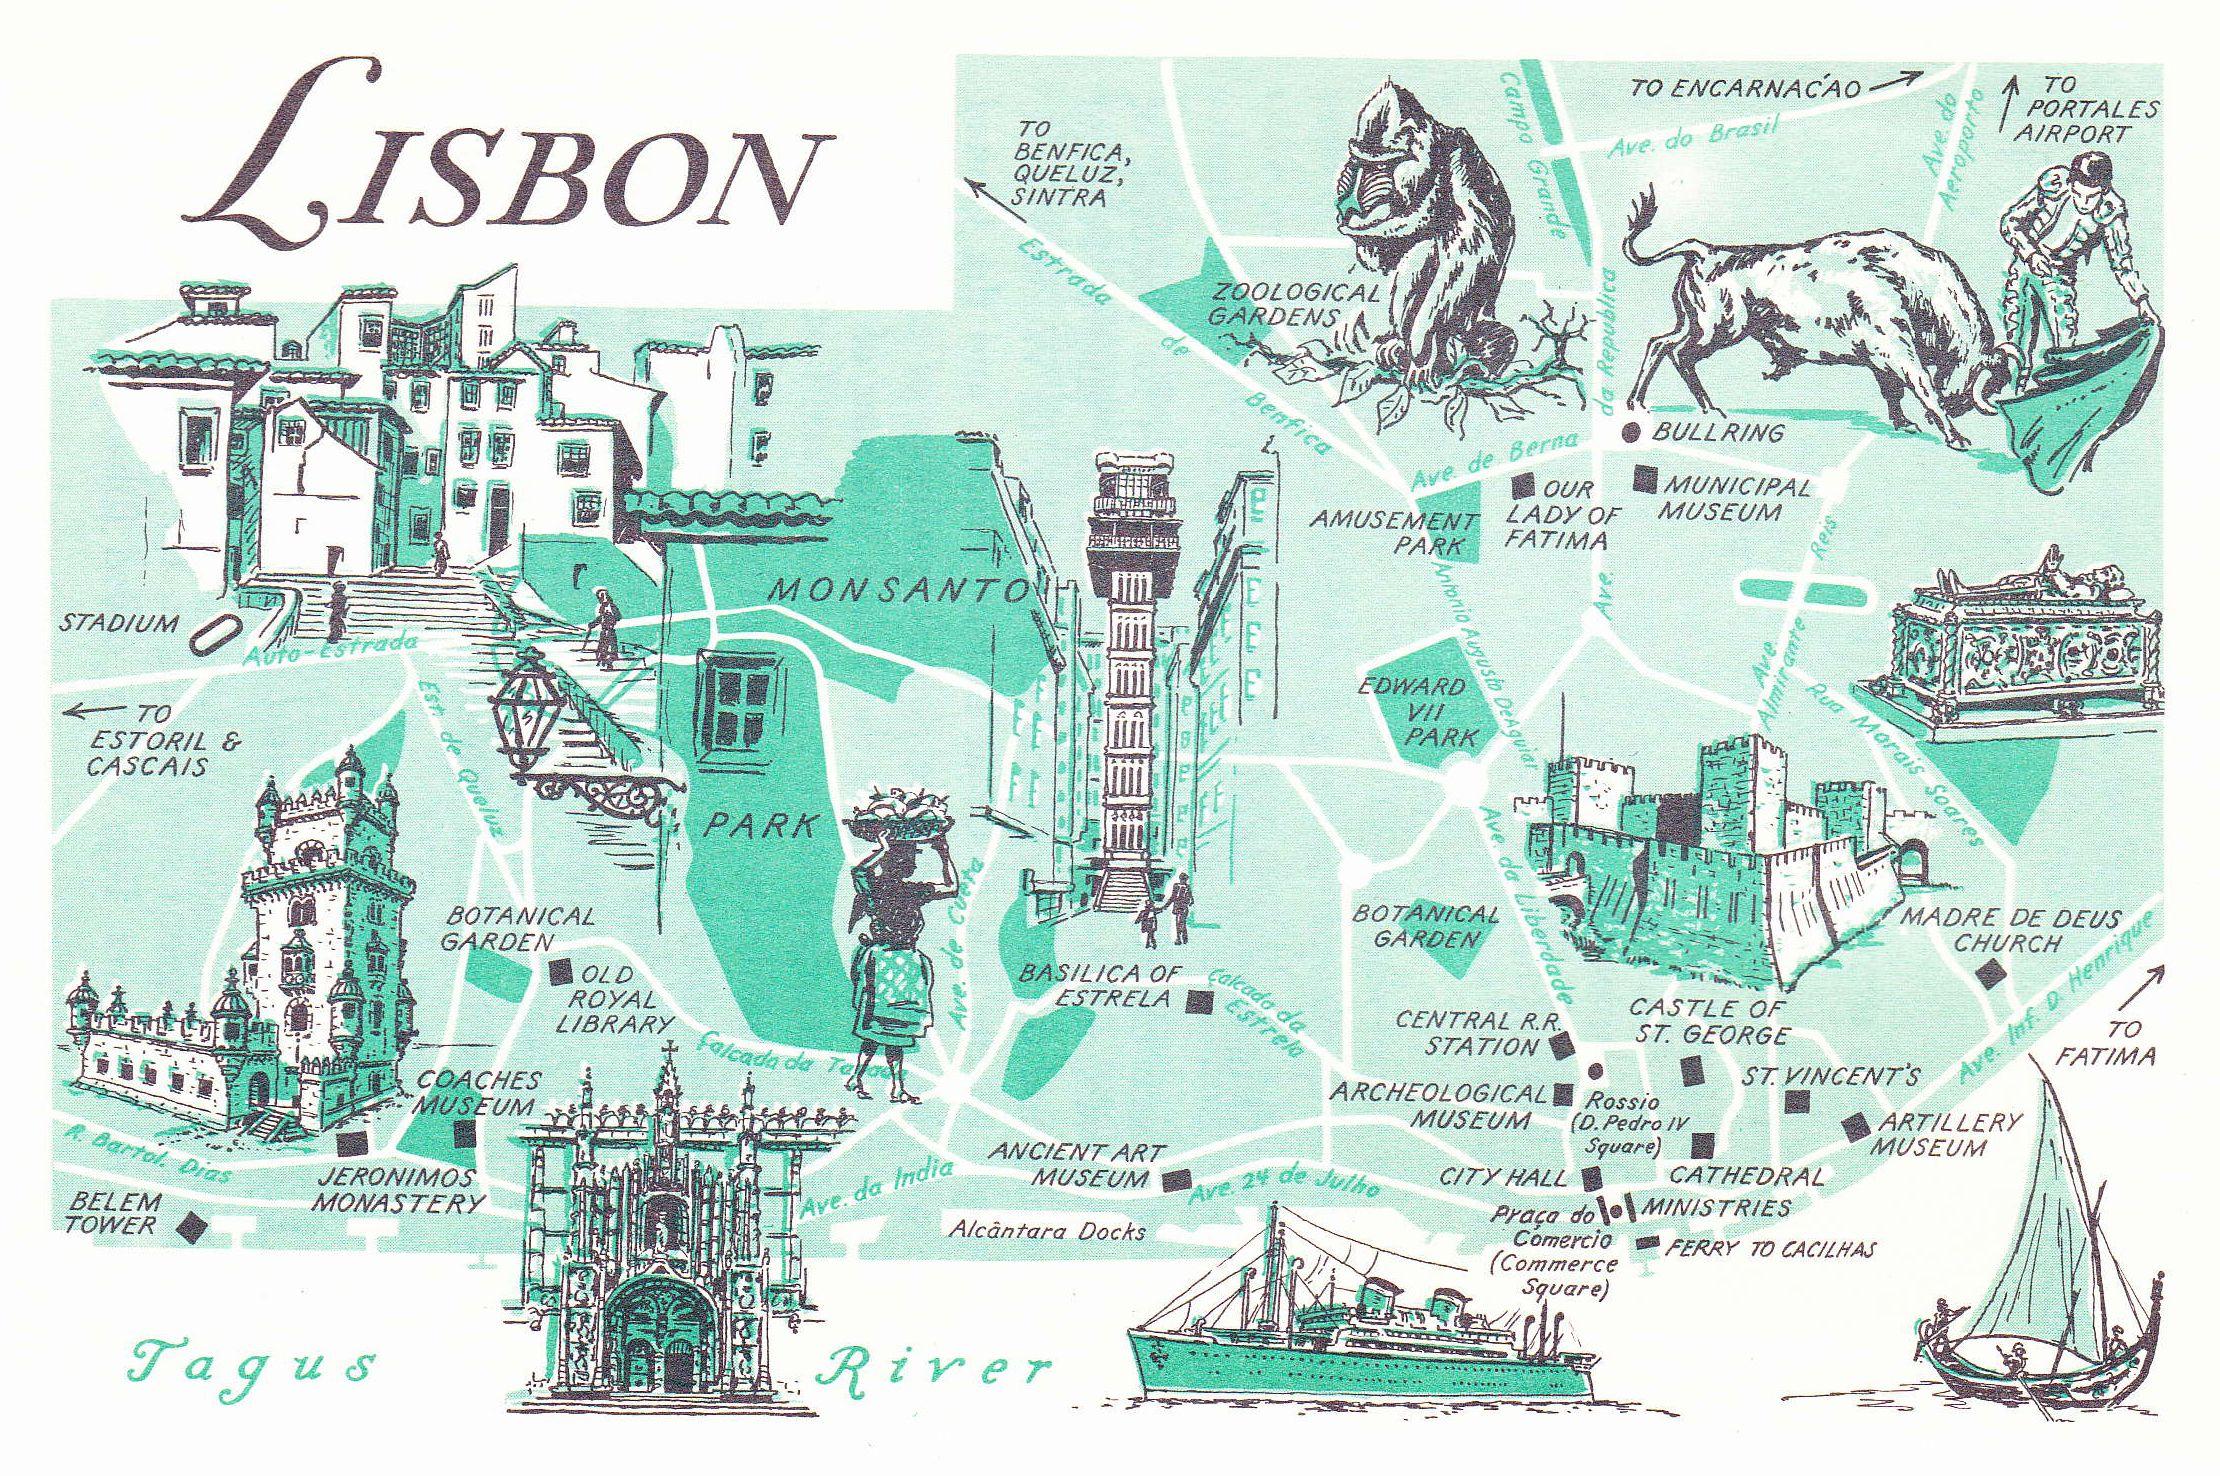 Old Map Of Lisbon Portugal Lisbon Maps Pinterest Mappen Europa Und Inseln